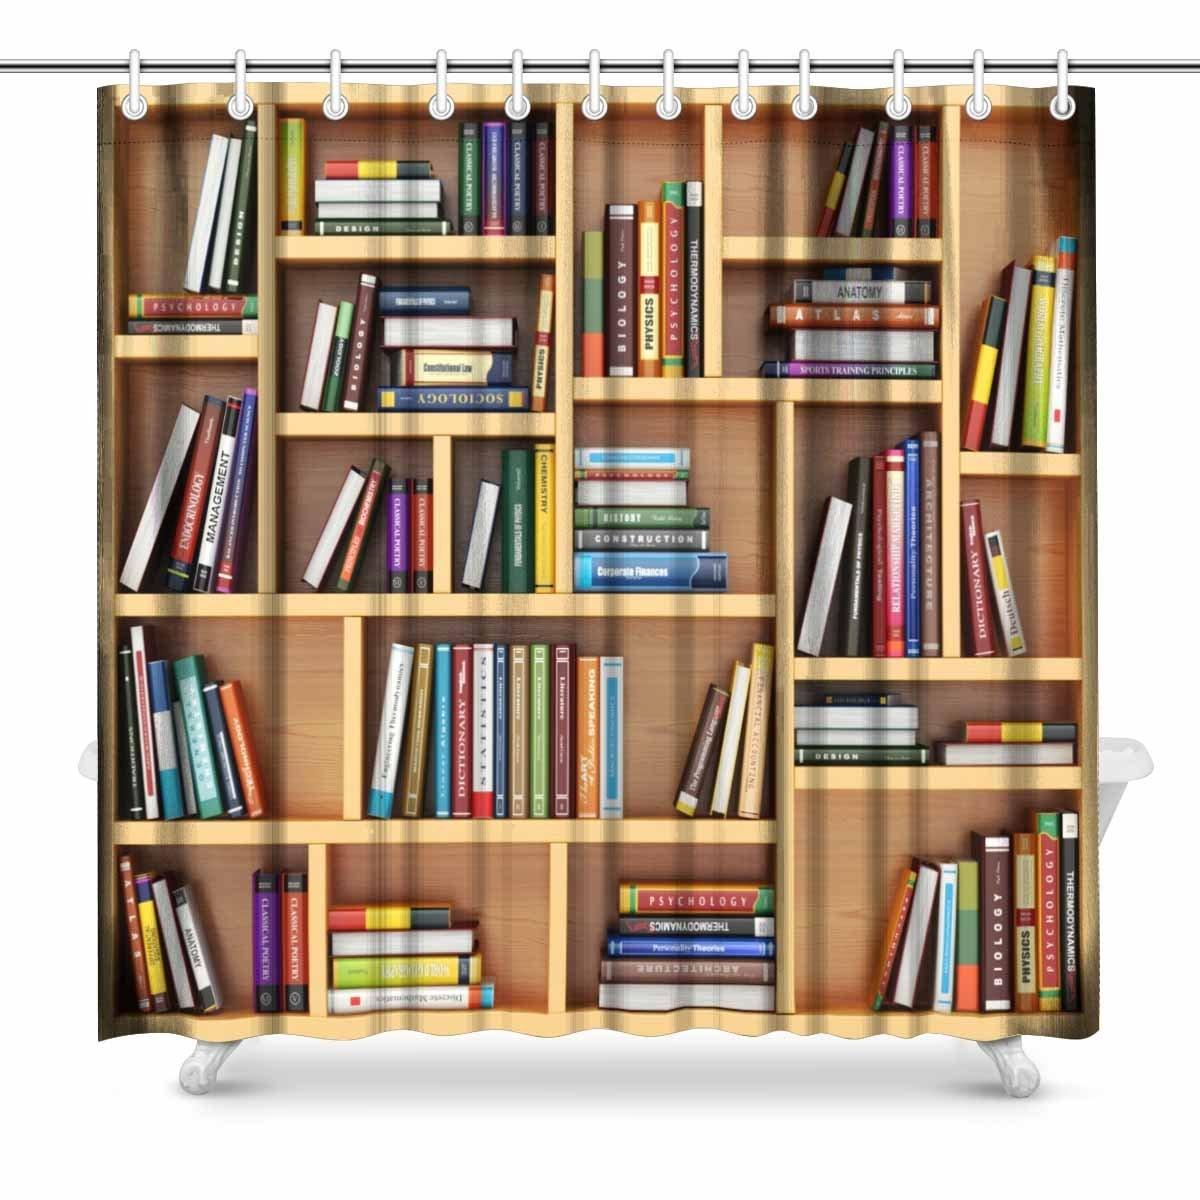 Bookshelf Waterproof Fabric Shower Curtain Hooks Bathroom Mat Home Decor